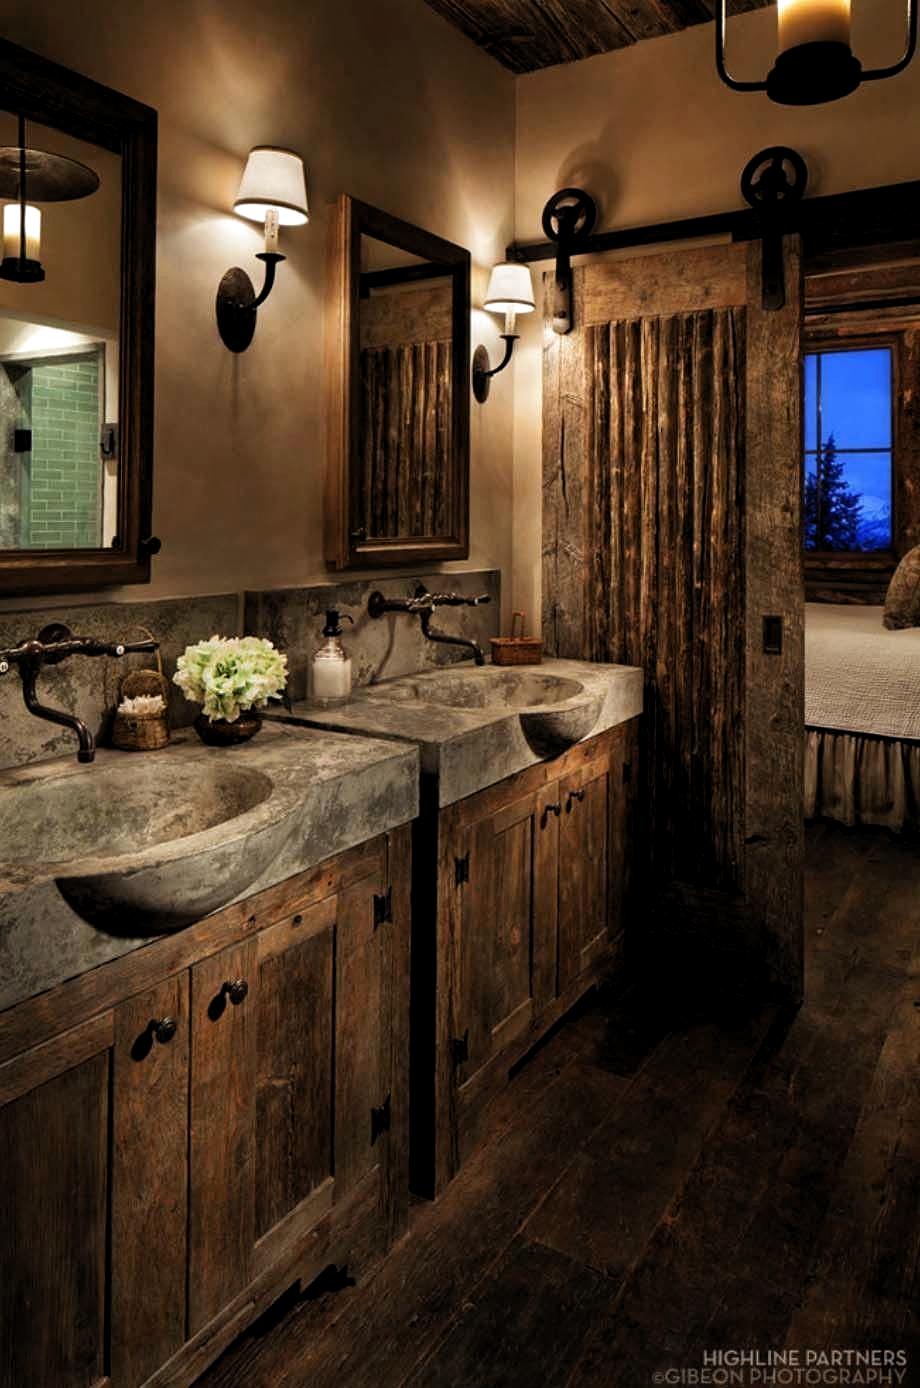 Image Result For Western Themed Bathroom Ideas Western Bathroom Decor All Things Western For The Bath In 2020 Western Bathroom Decor Rustic Bathrooms Western Bathrooms